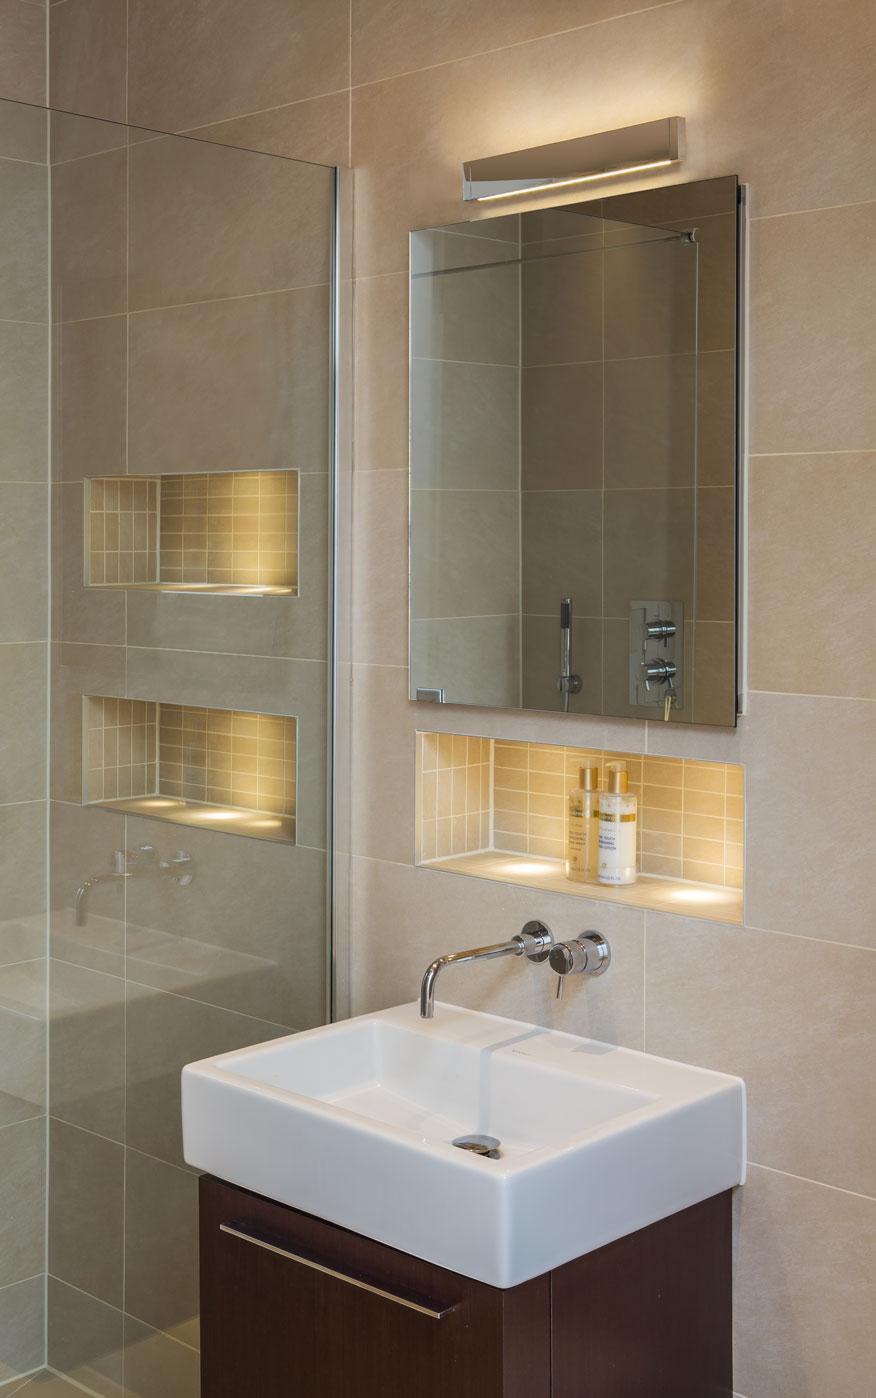 BERGAMO LED applique per bagno